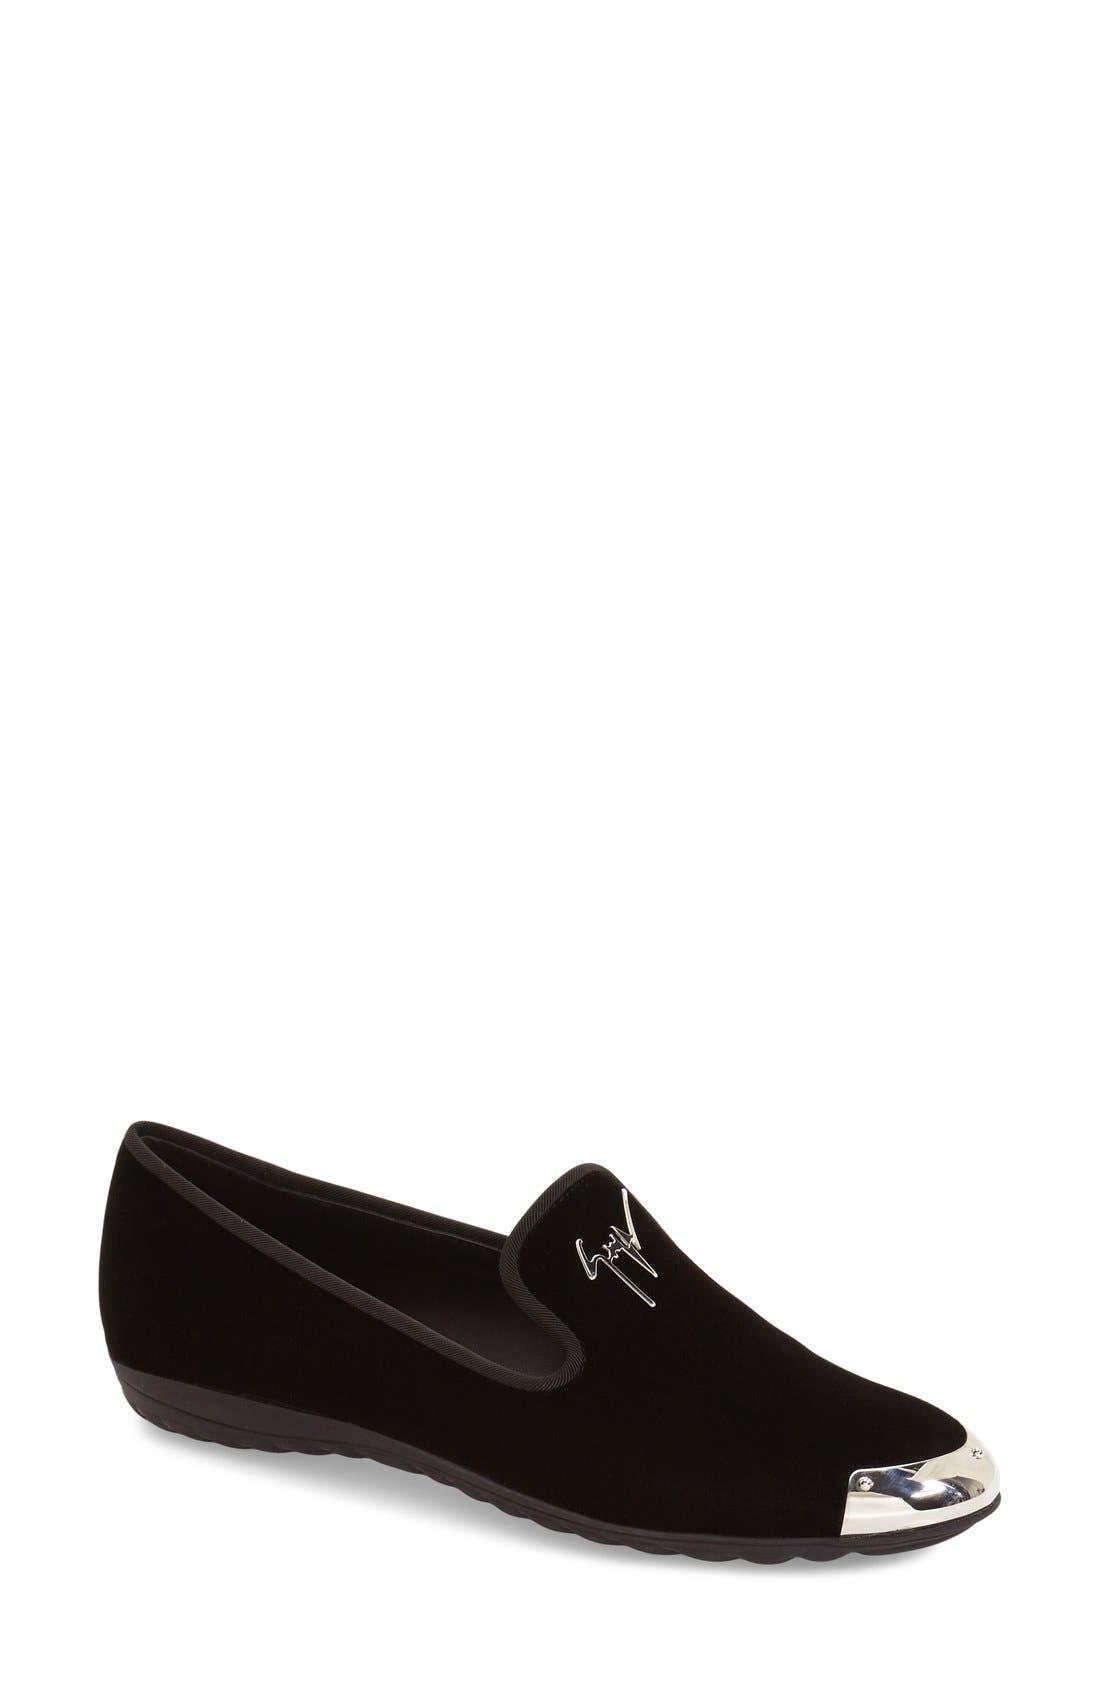 'Dalila' Metallic Toe Velour Loafer,                         Main,                         color,